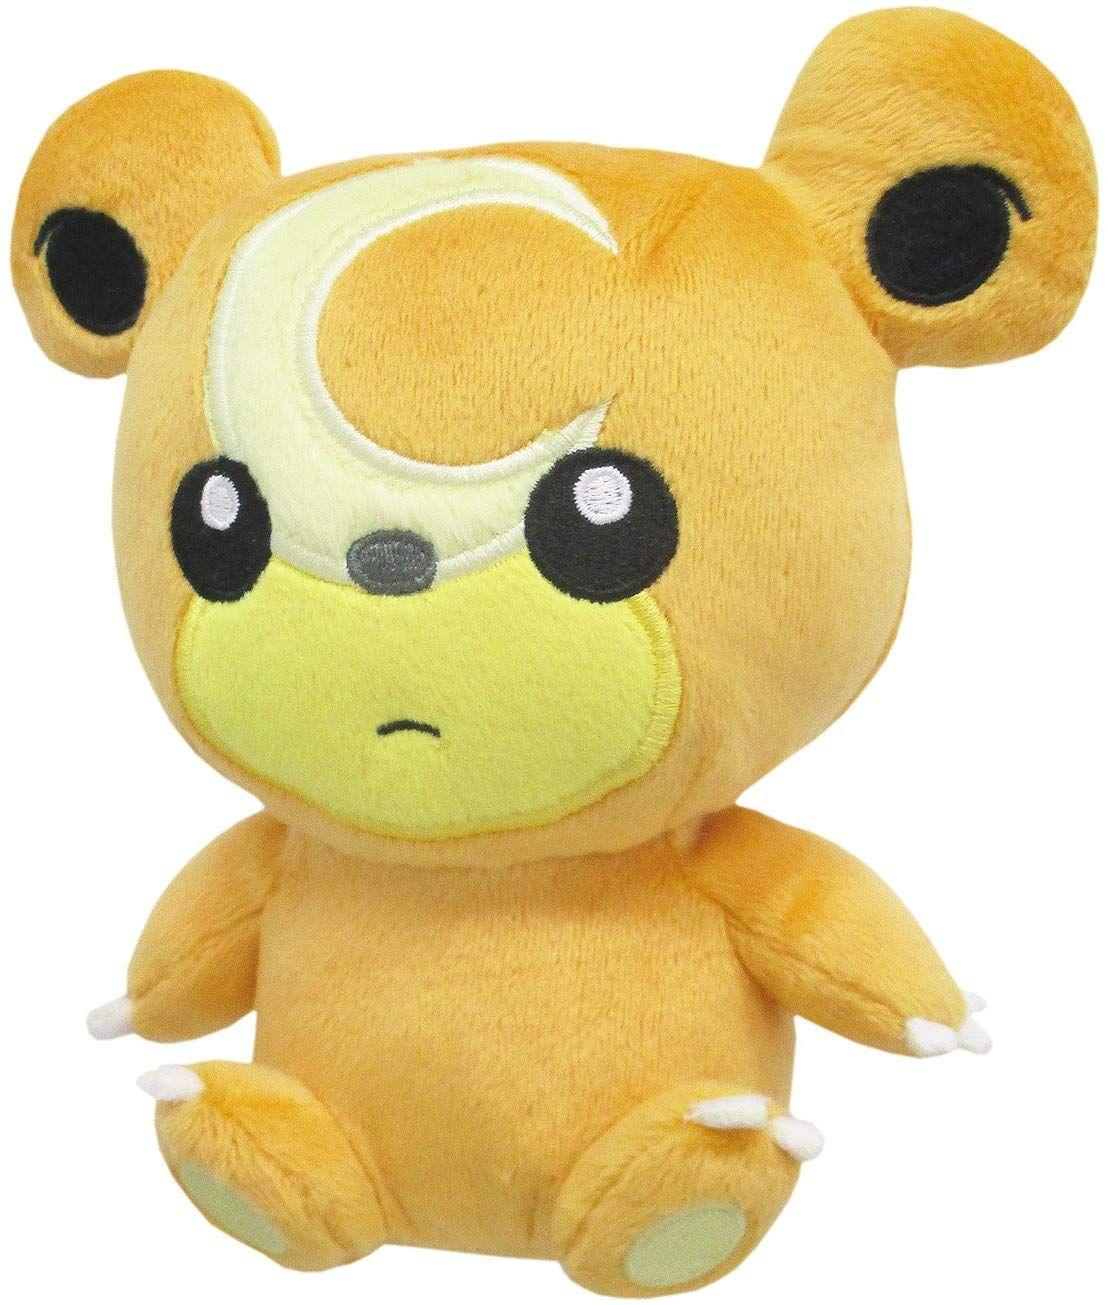 Pokemon Center Original Limited Plush Doll Snorlax Mania Pikachu JAPAN IMPORT